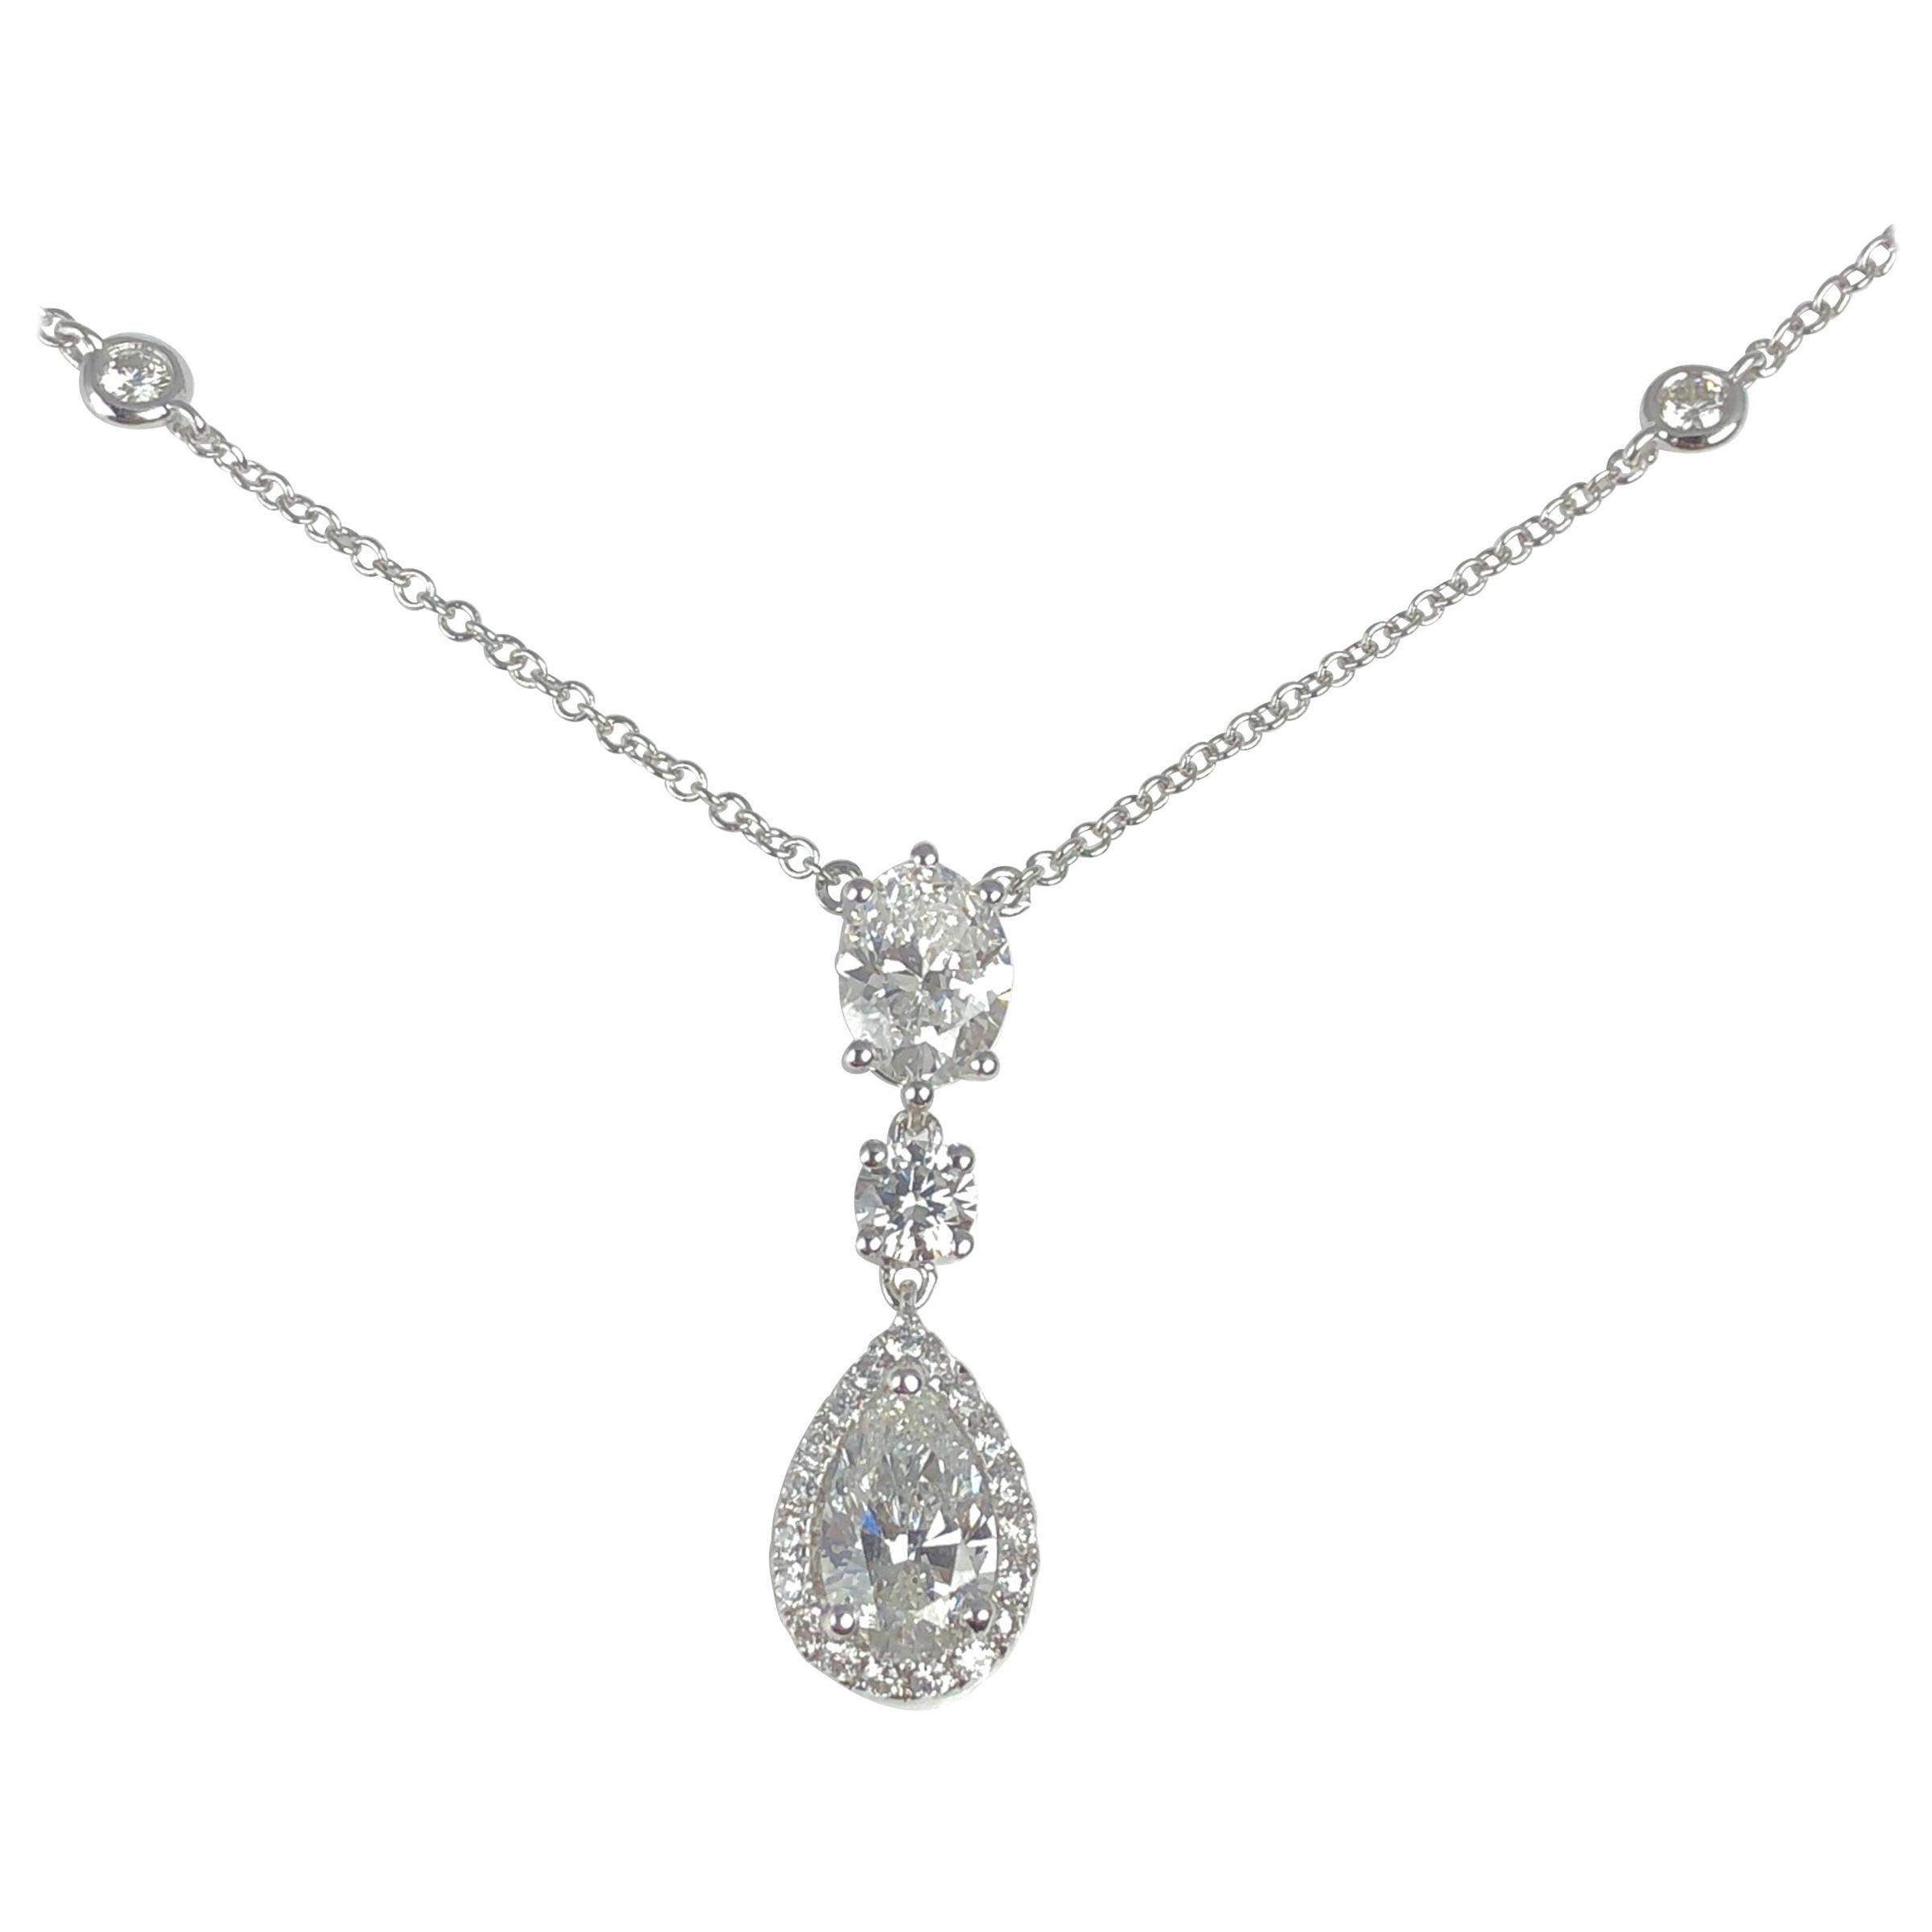 DiamondTown 1.77 Carat Diamond Three-Tier Pendant in 18 Karat White Gold